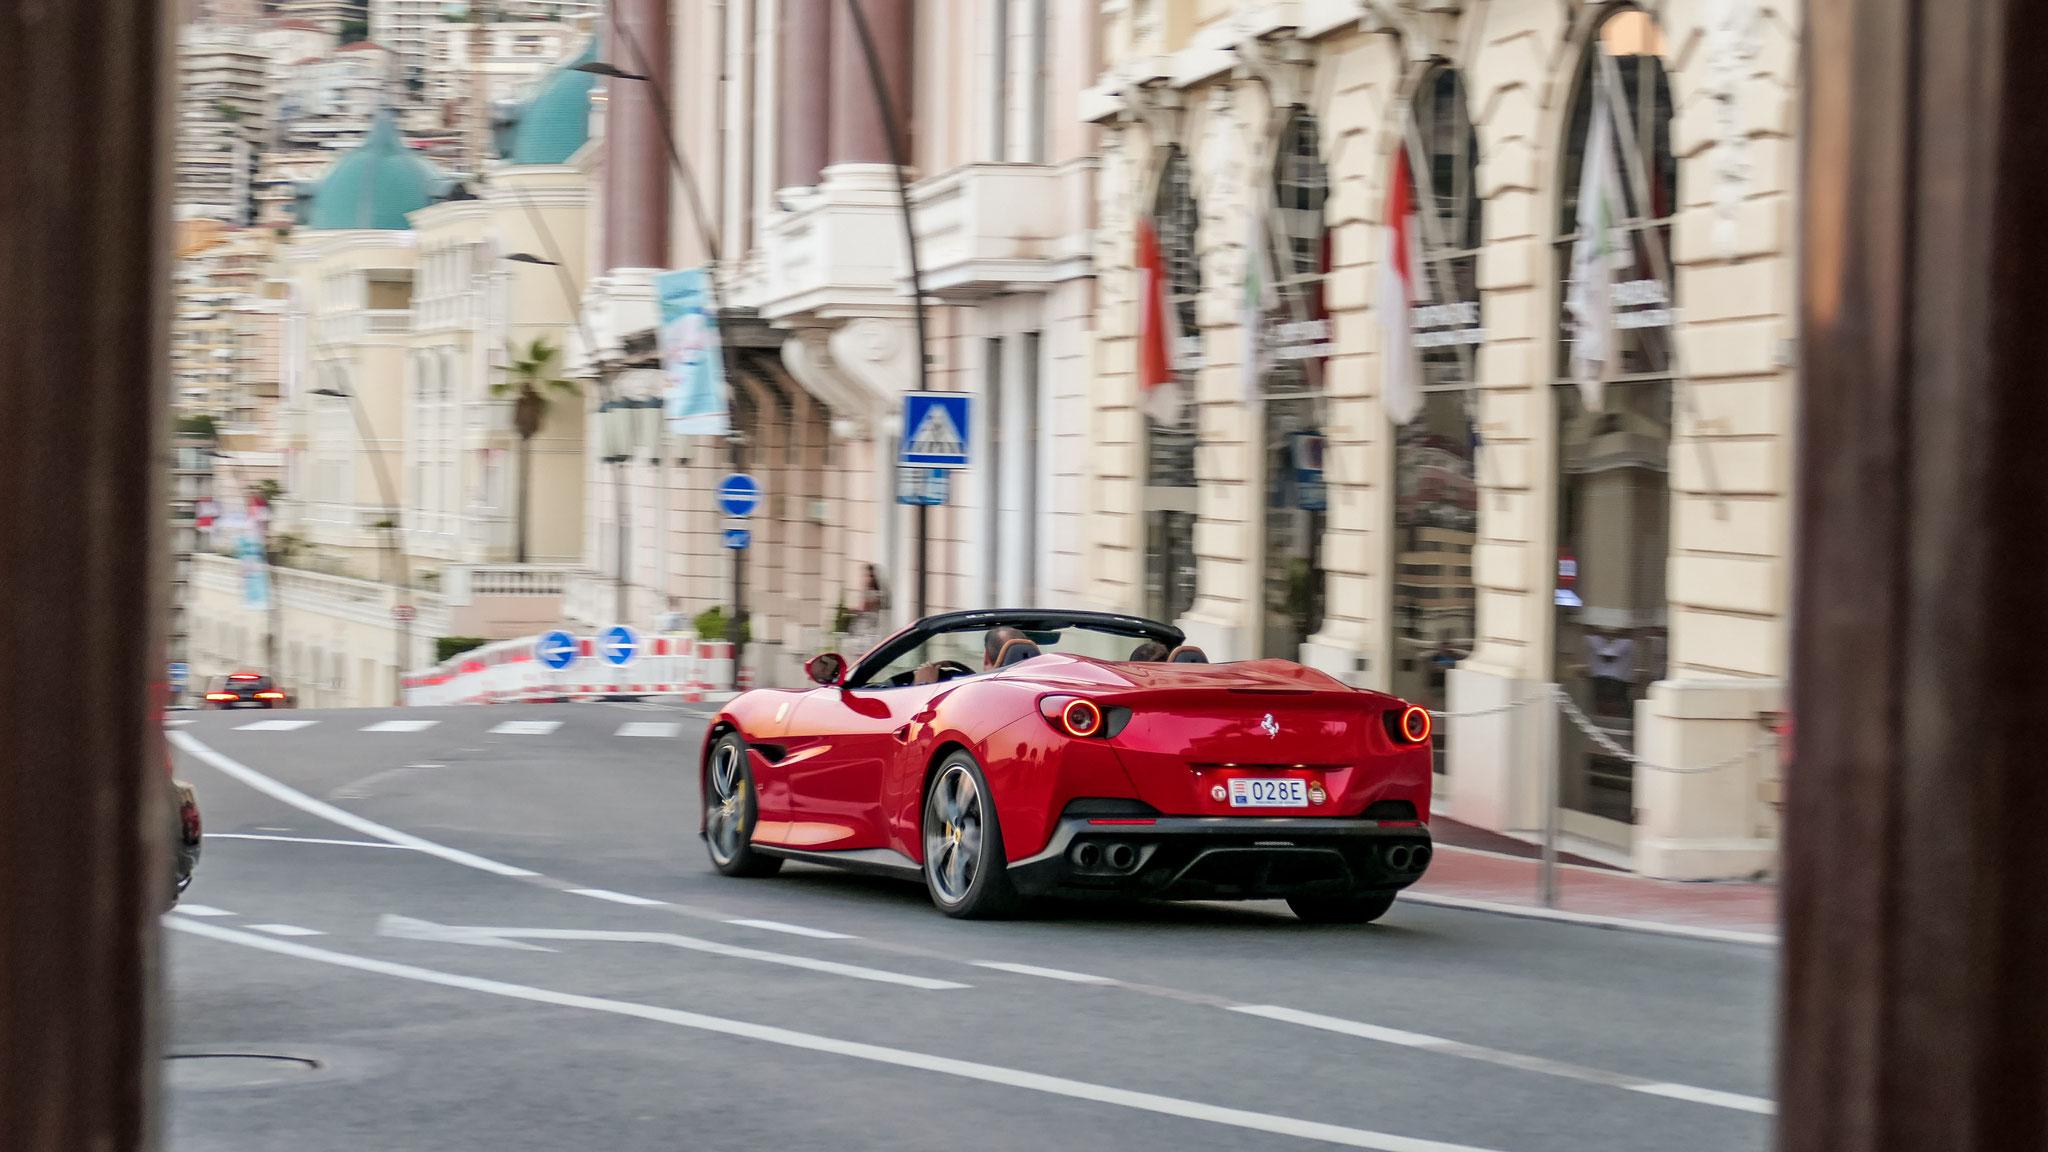 Ferrari Portofino - 028E (MC)